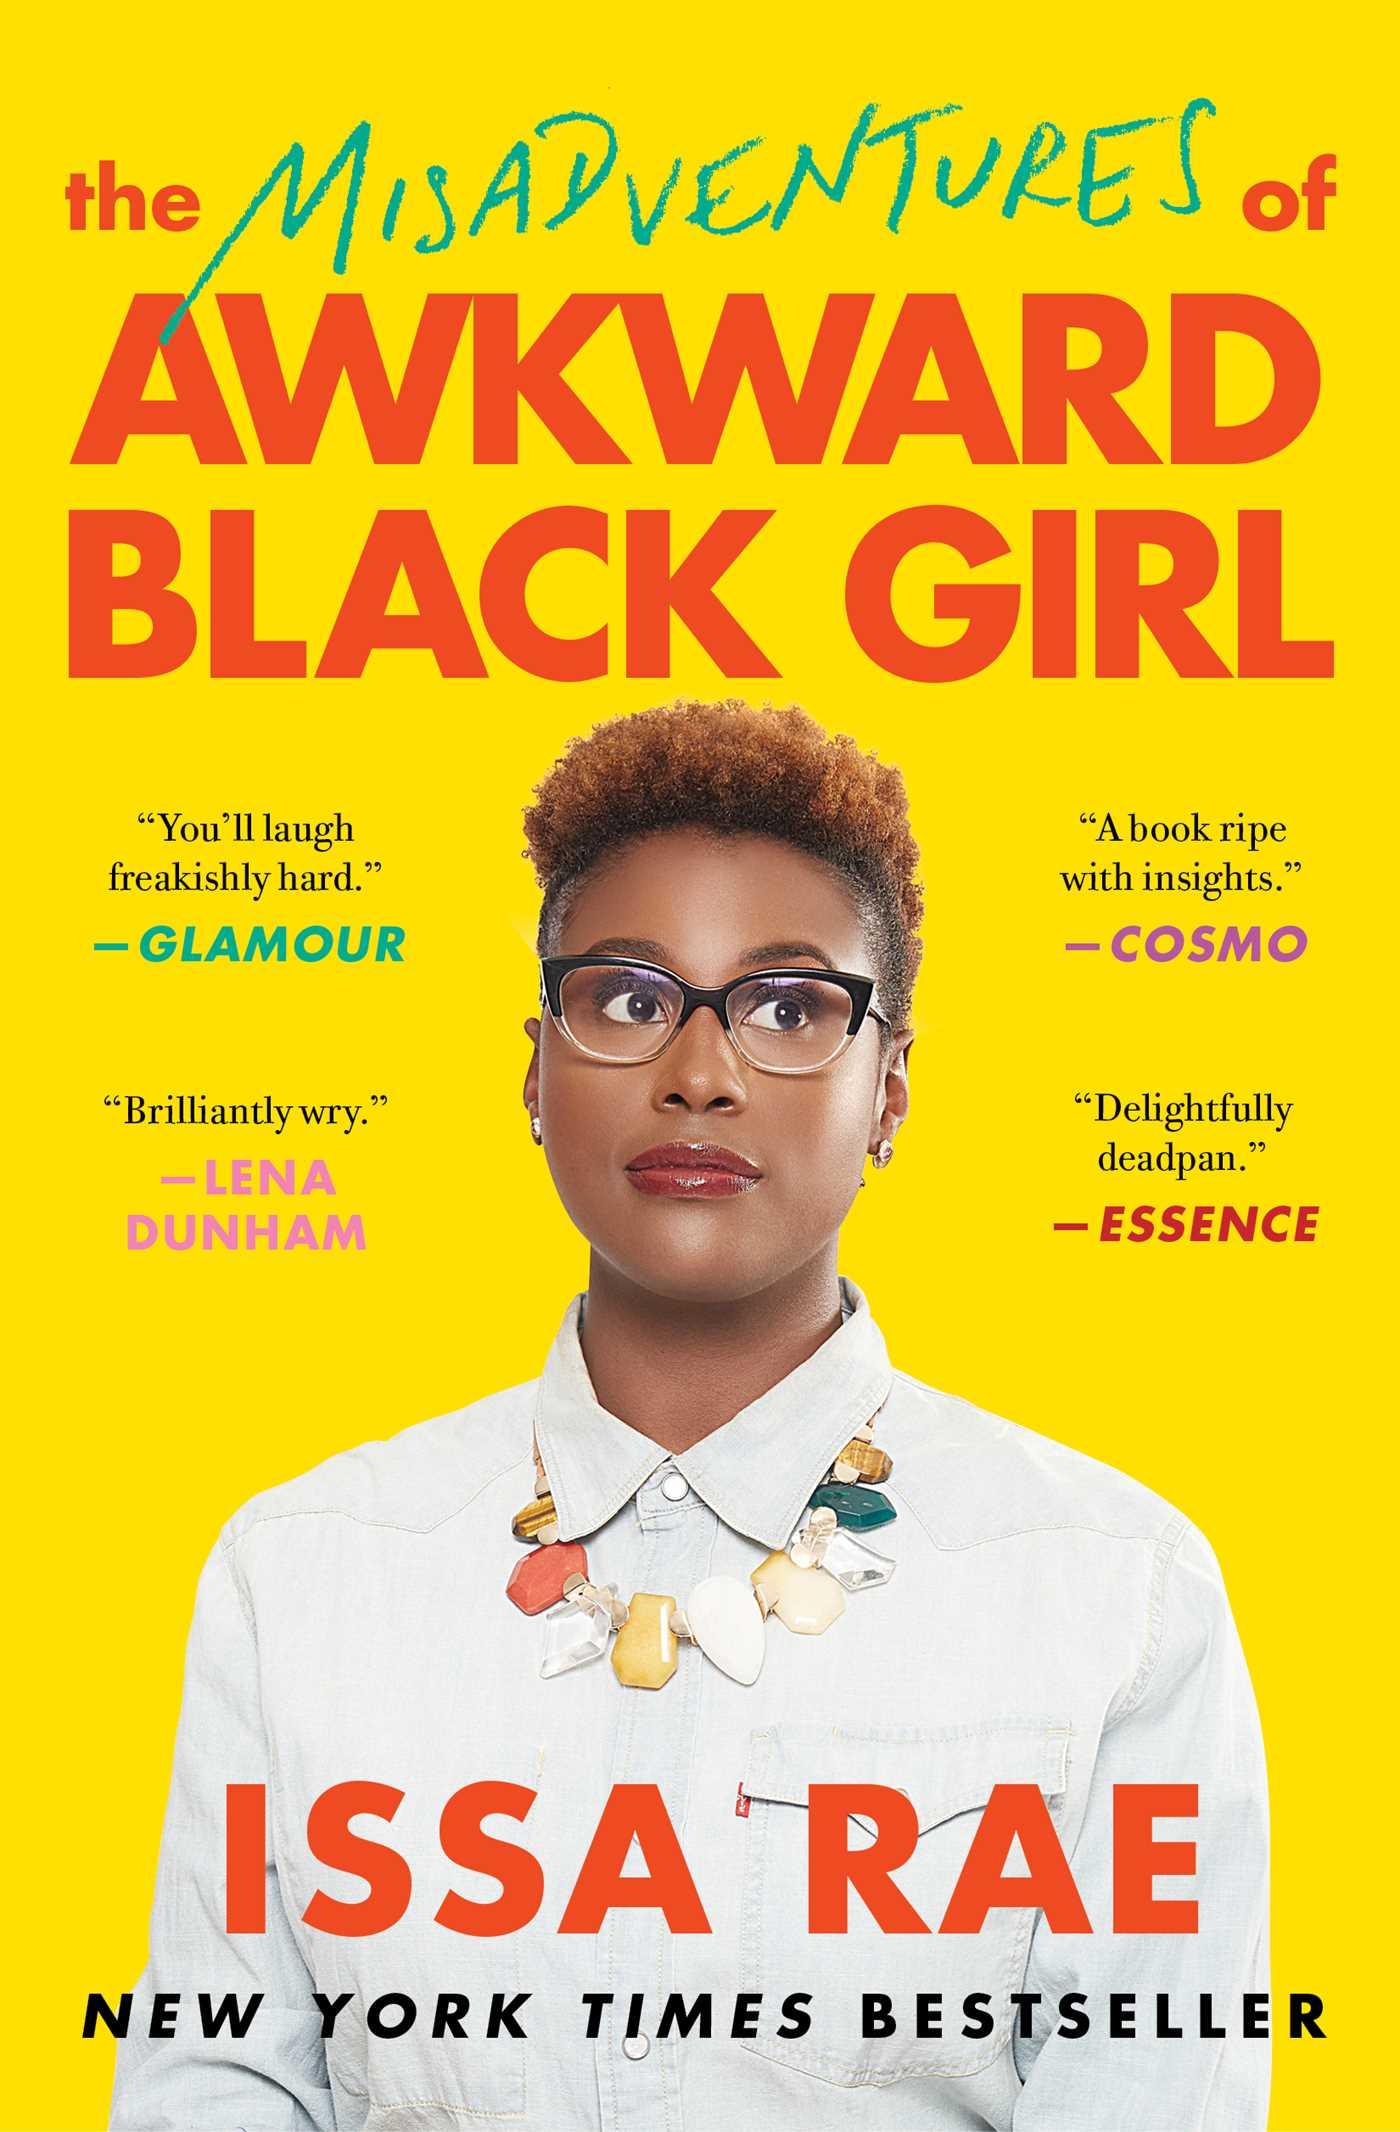 the-misadventures-of-awkward-black-girl-9781476749075_hr.jpg